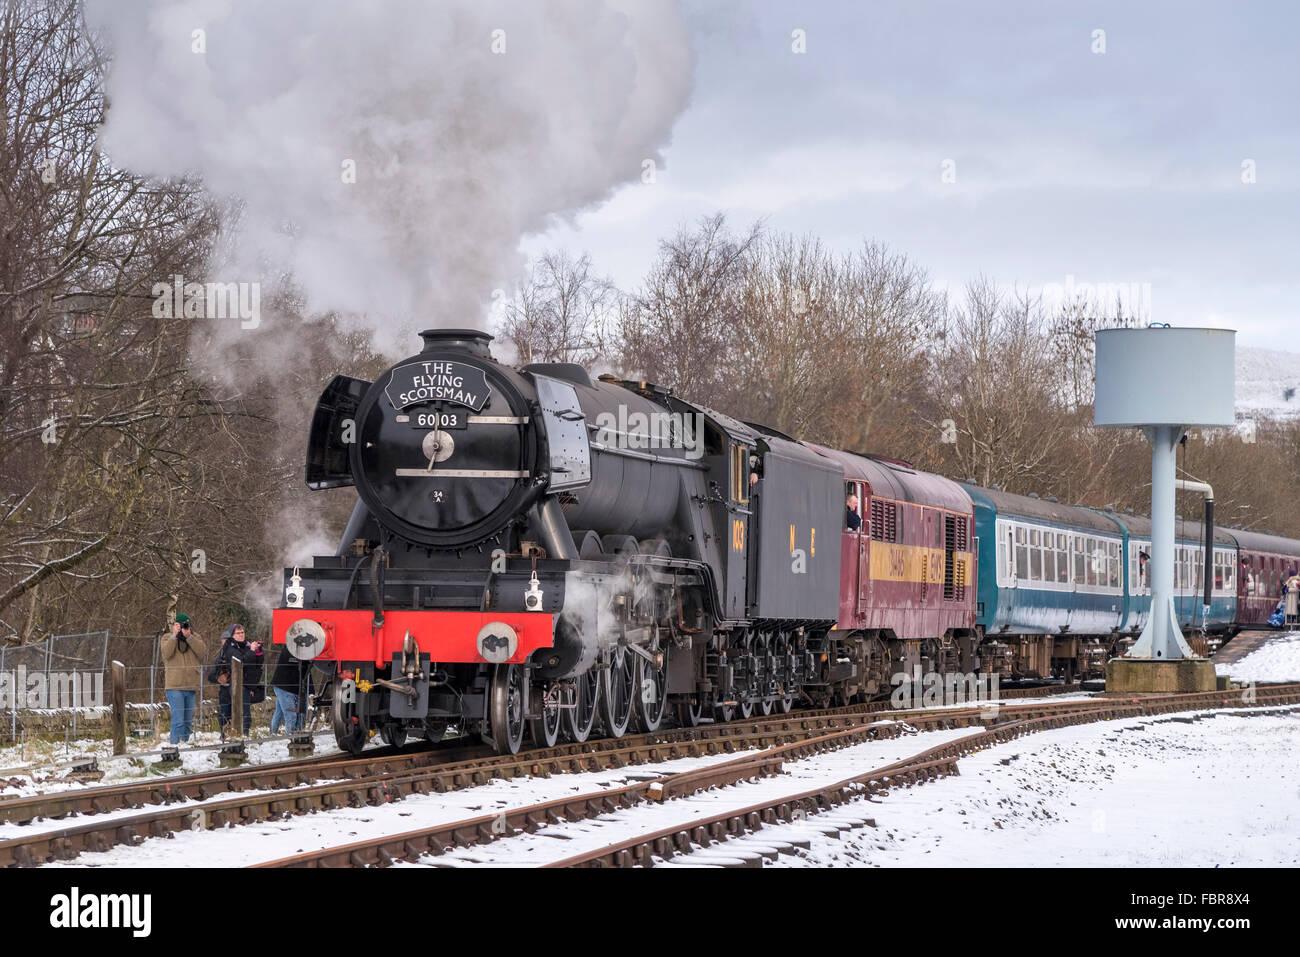 The newly restored Flying Scotsman locomotive on the East Lancashire railway. Stock Photo